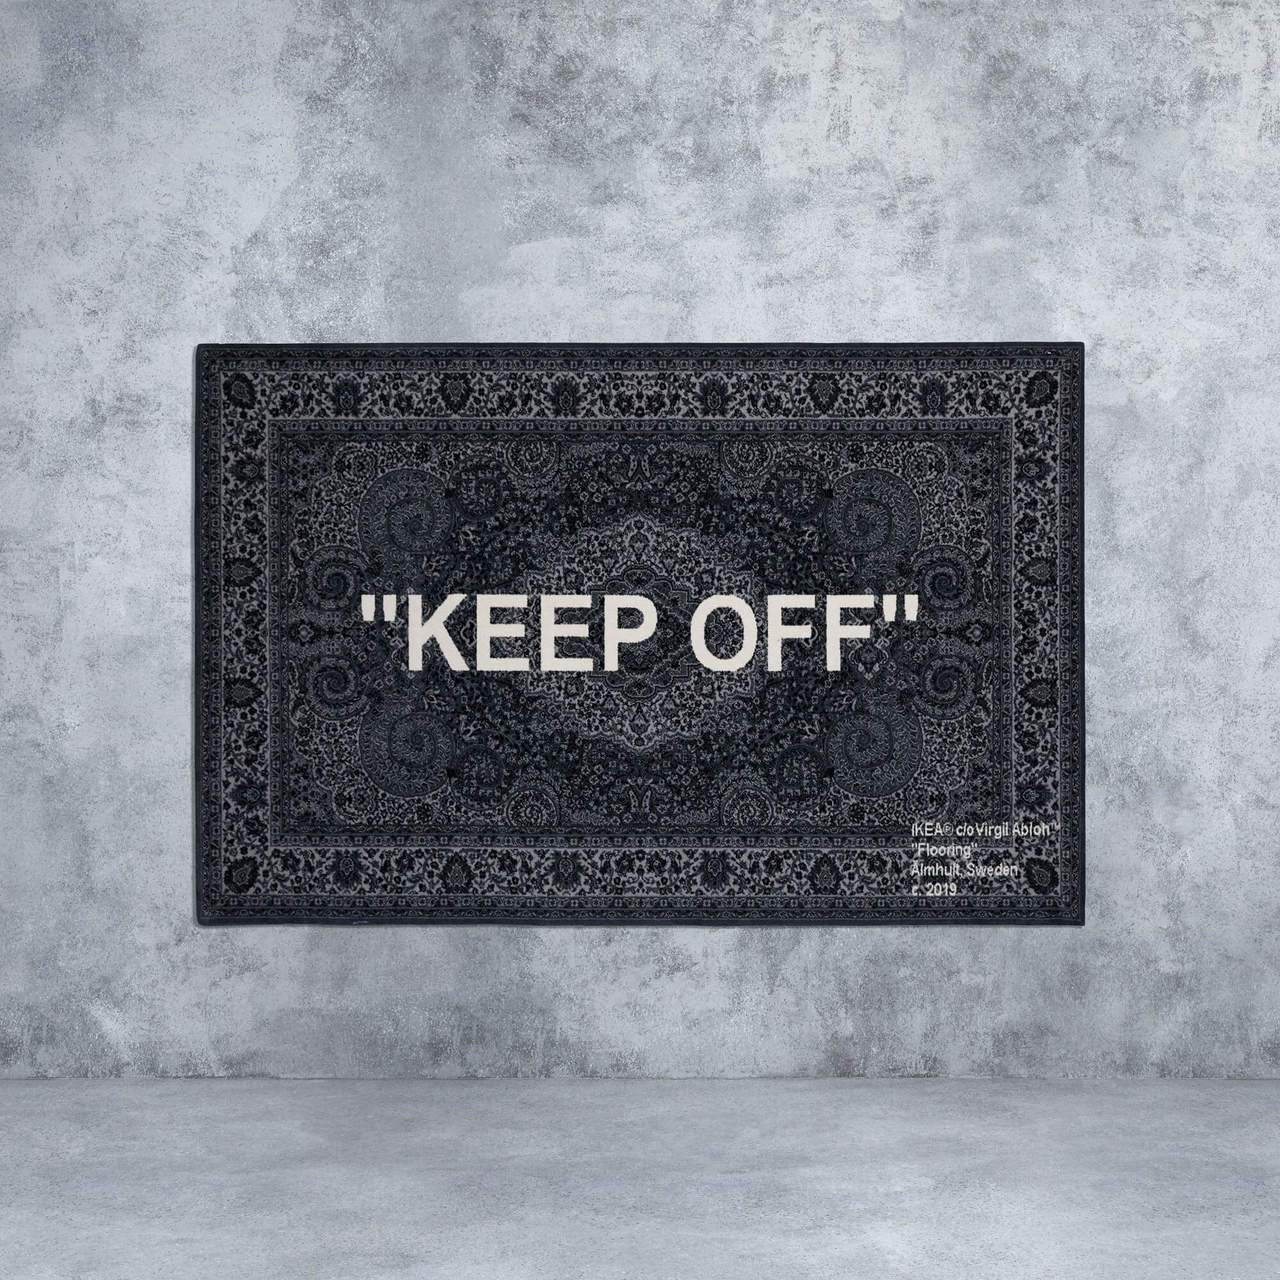 IKEA X Off-White聯名地毯以諷刺手法傳達幽默與省思,售價13,90...